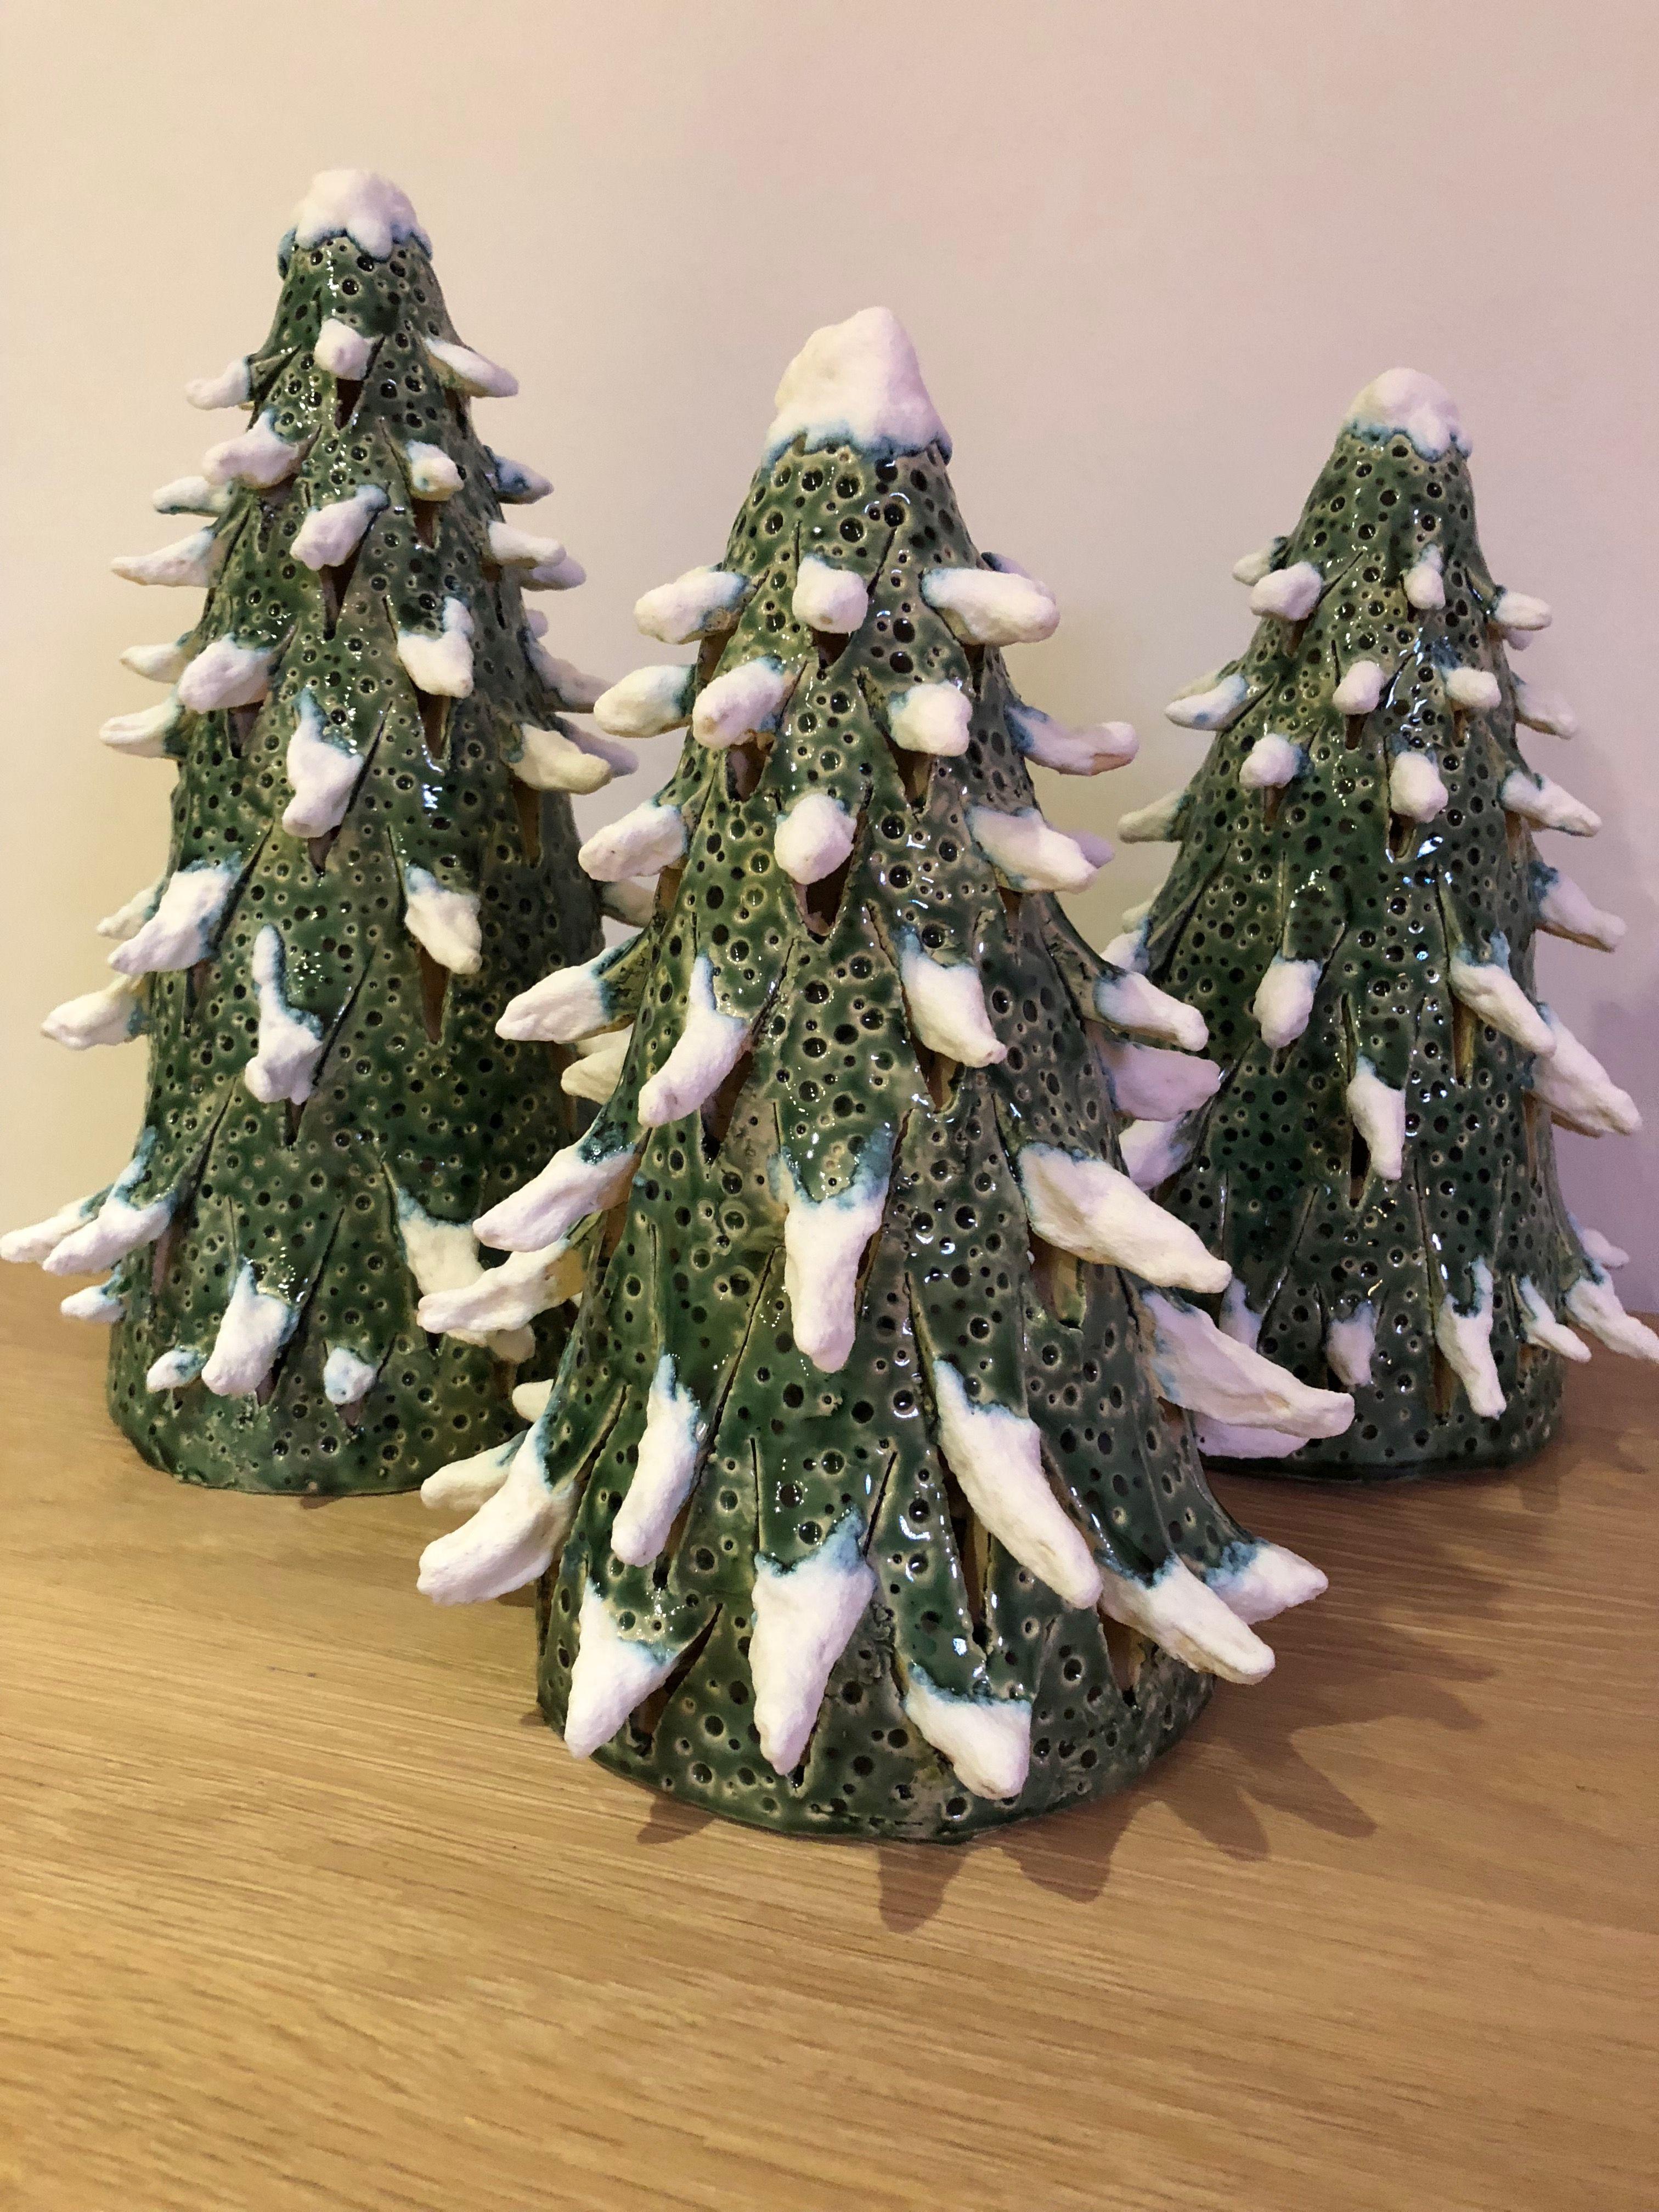 keramik tannenbaum mit schneeglasur  keramik ideen